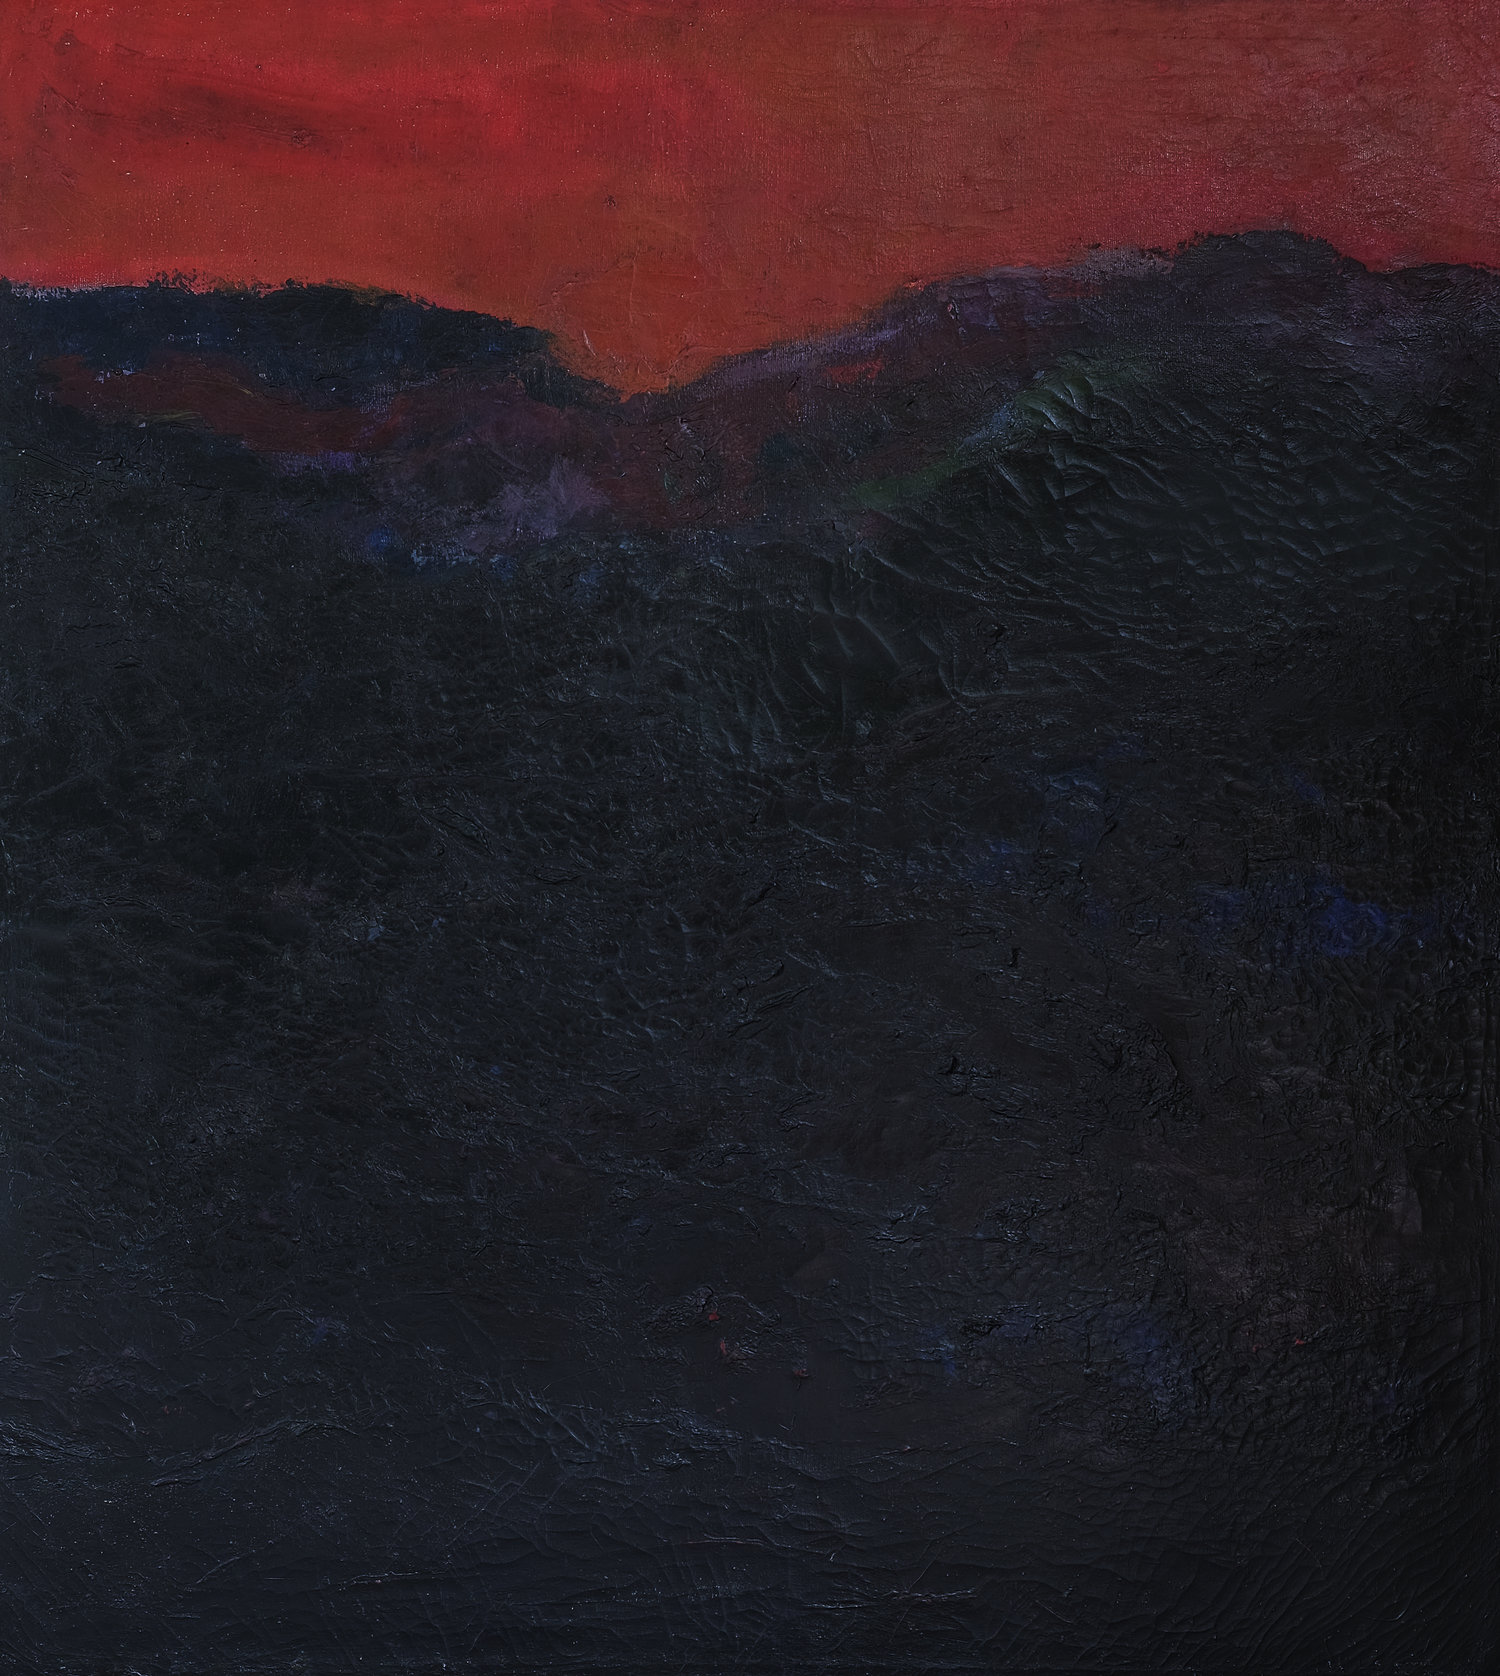 Popo Iskandar, Bukit Senja (Hills at Dusk), 1989, 90 x 100 cm